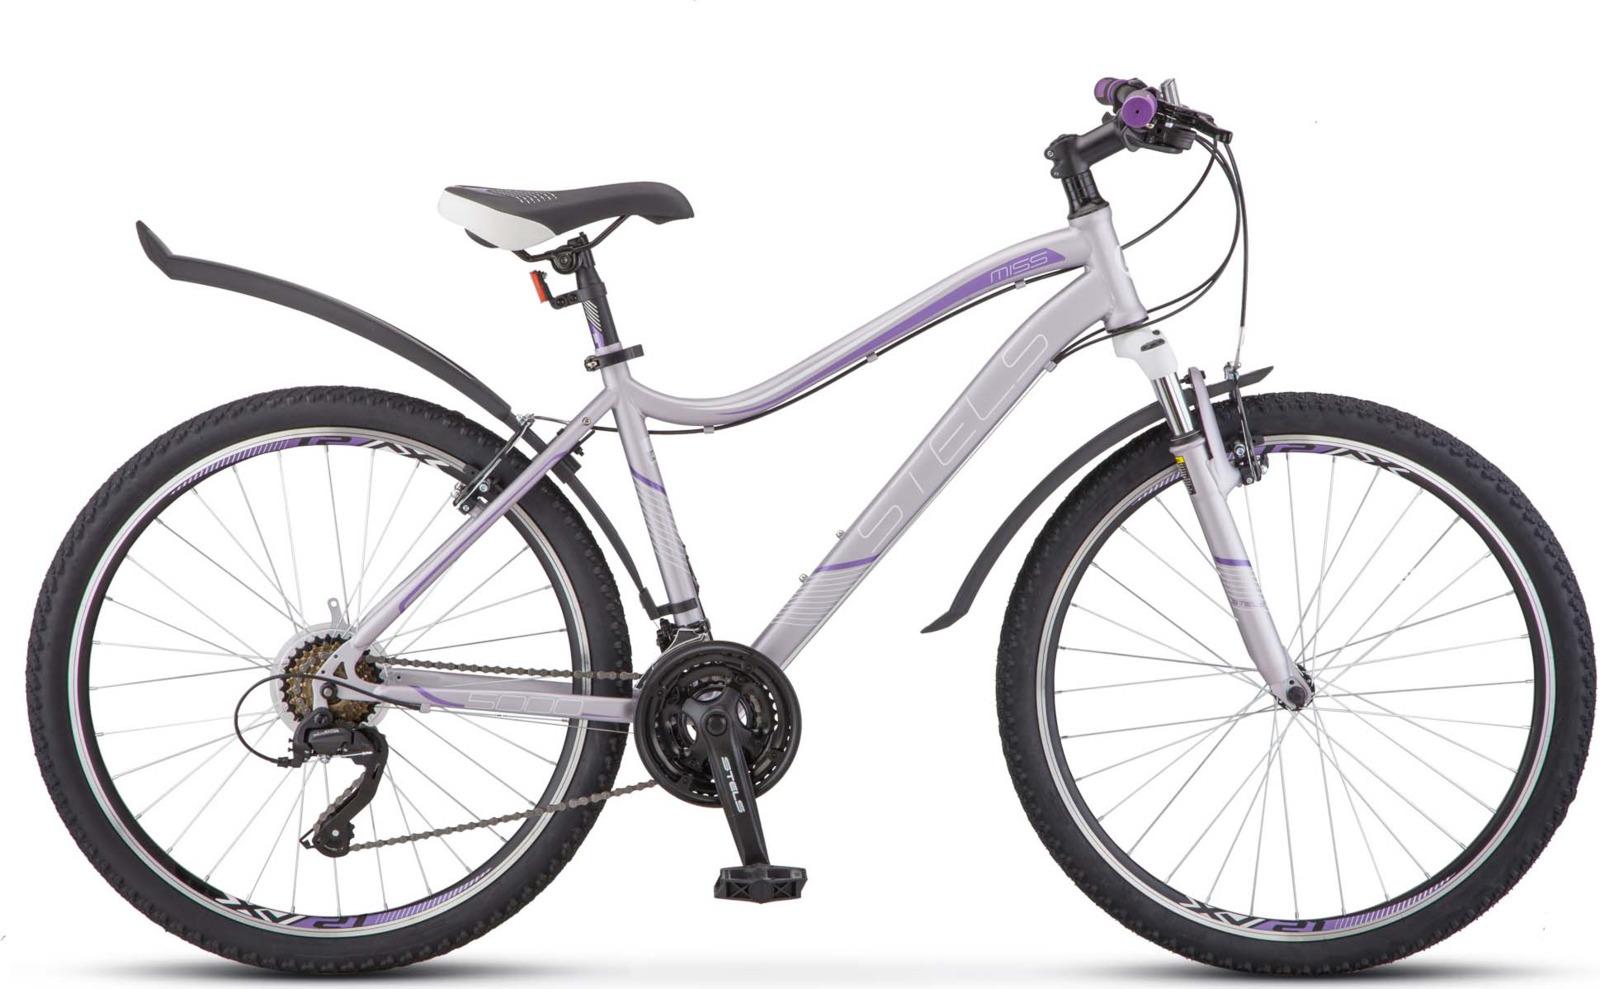 Велосипед Stels Miss-5000 V 26, KUBC0046252017, сиреневый цены